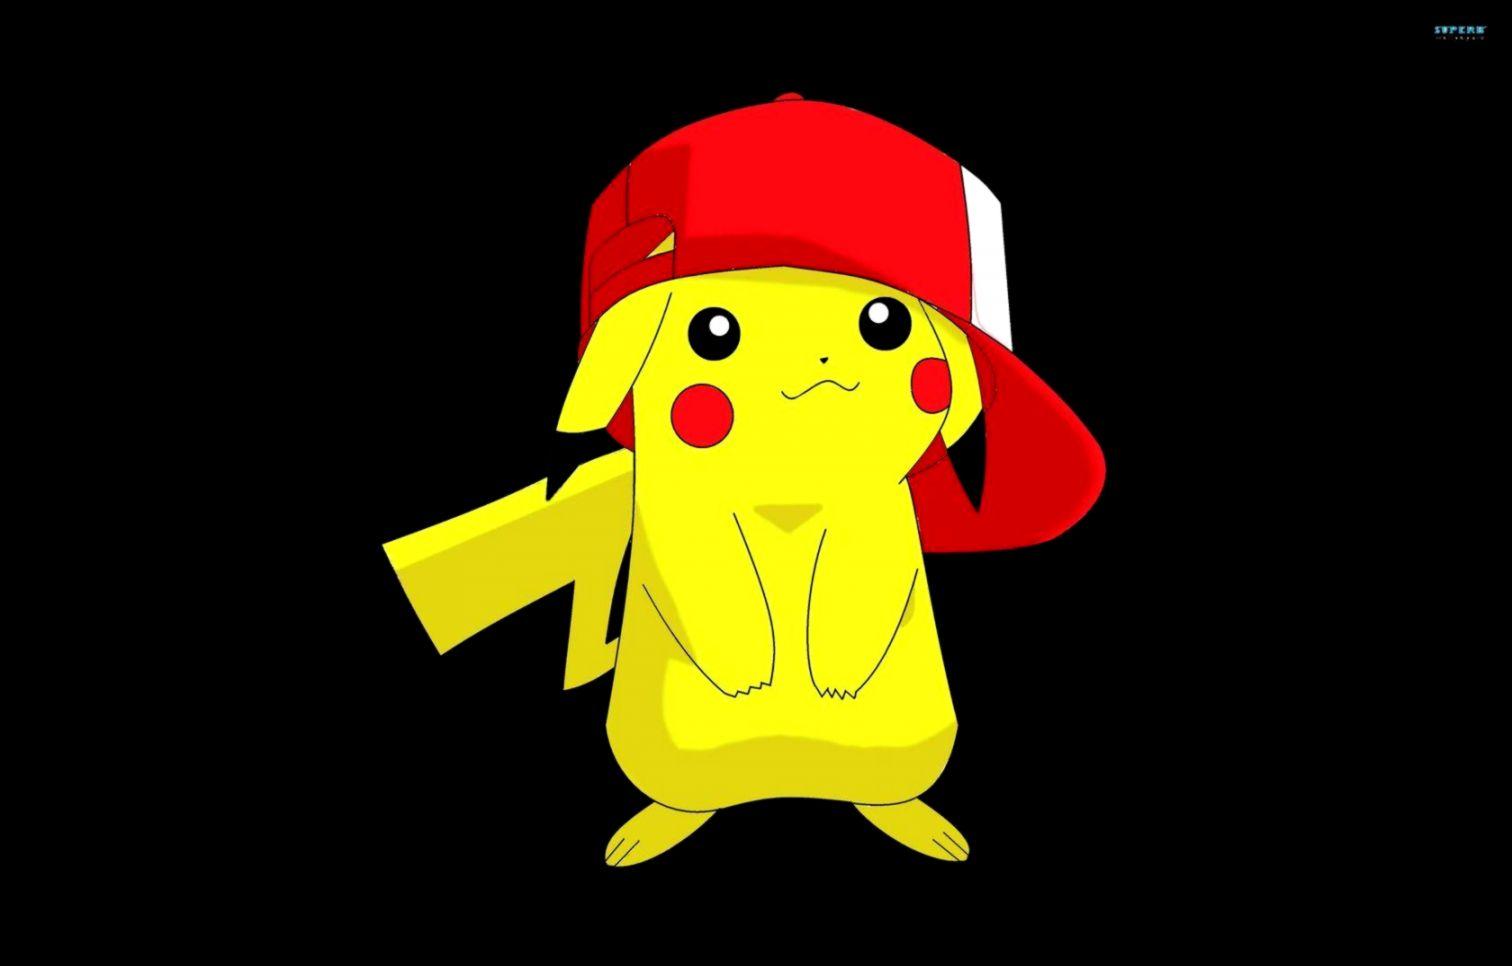 Pikachu Hd Wallpaper | Eazy Wallpapers